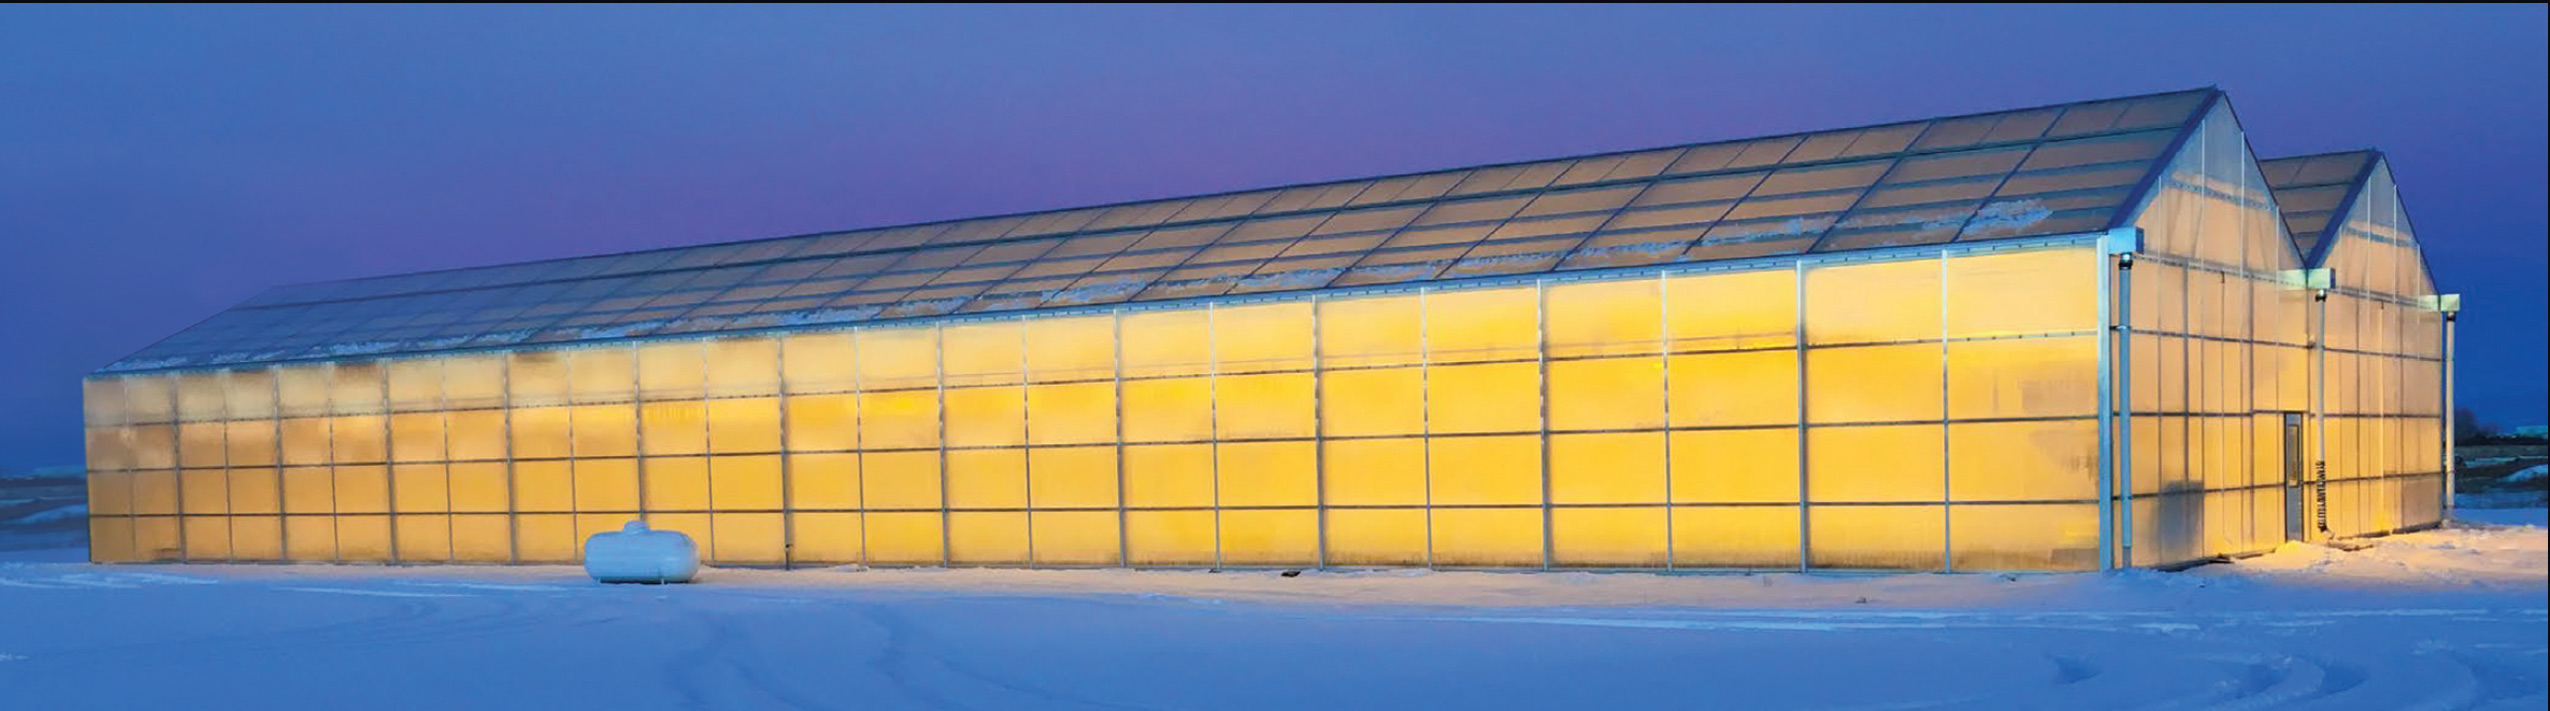 Forever Flowering Greenhouse Light Deprivation